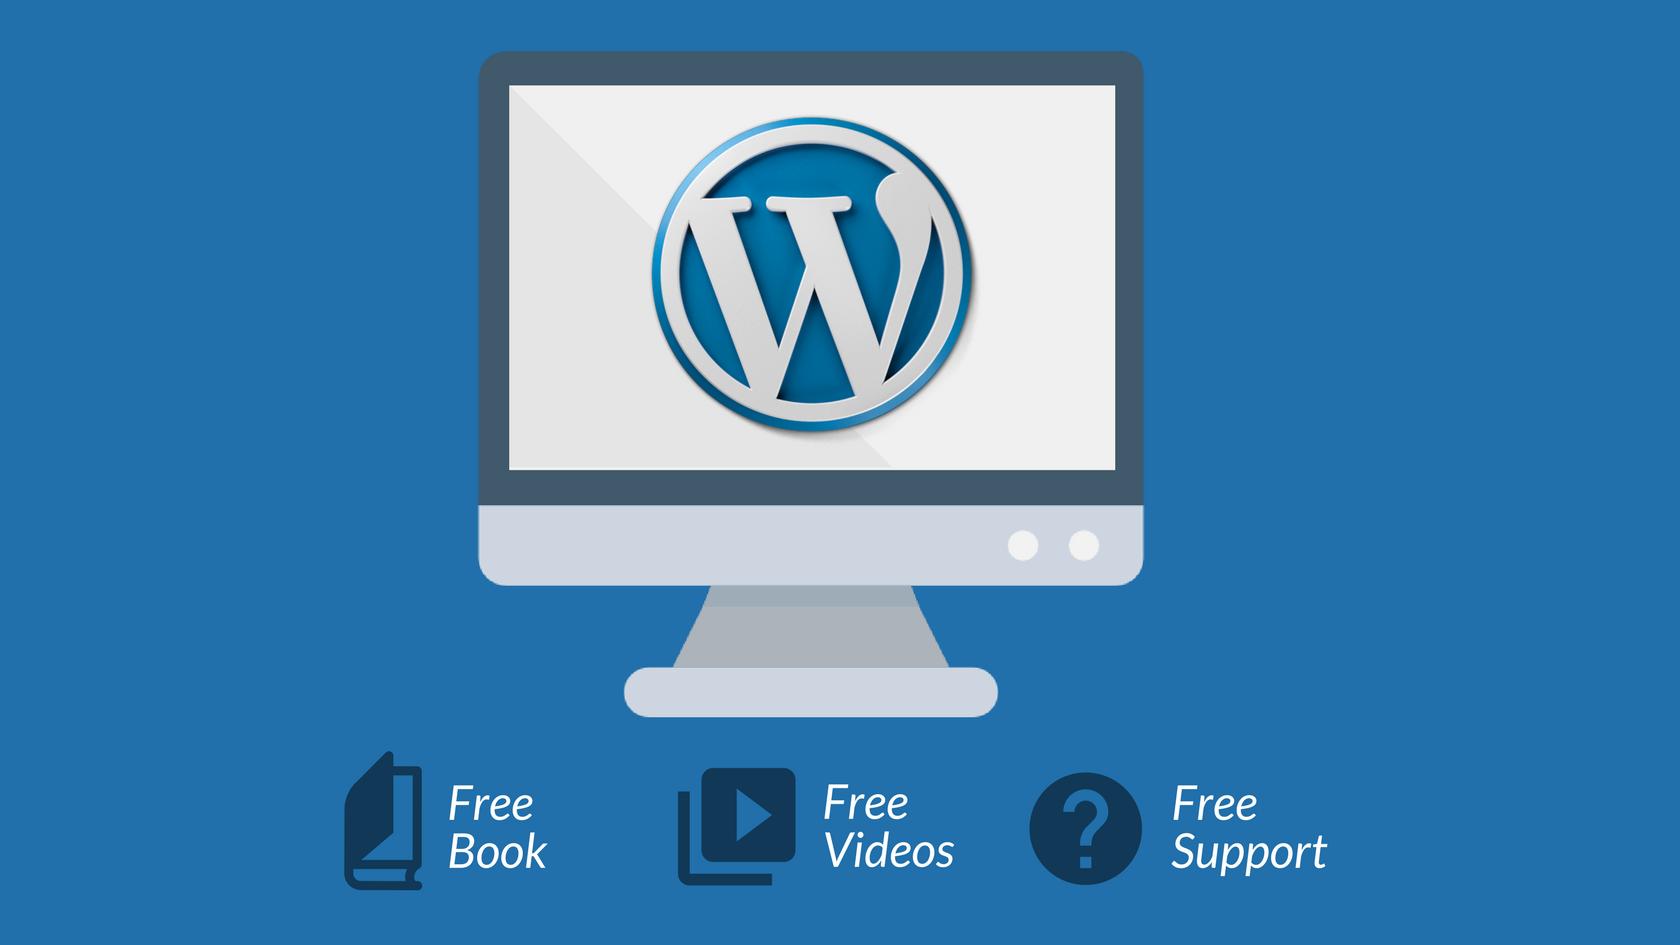 Beginner's tutorial on using yoast wordpress seo plugin.